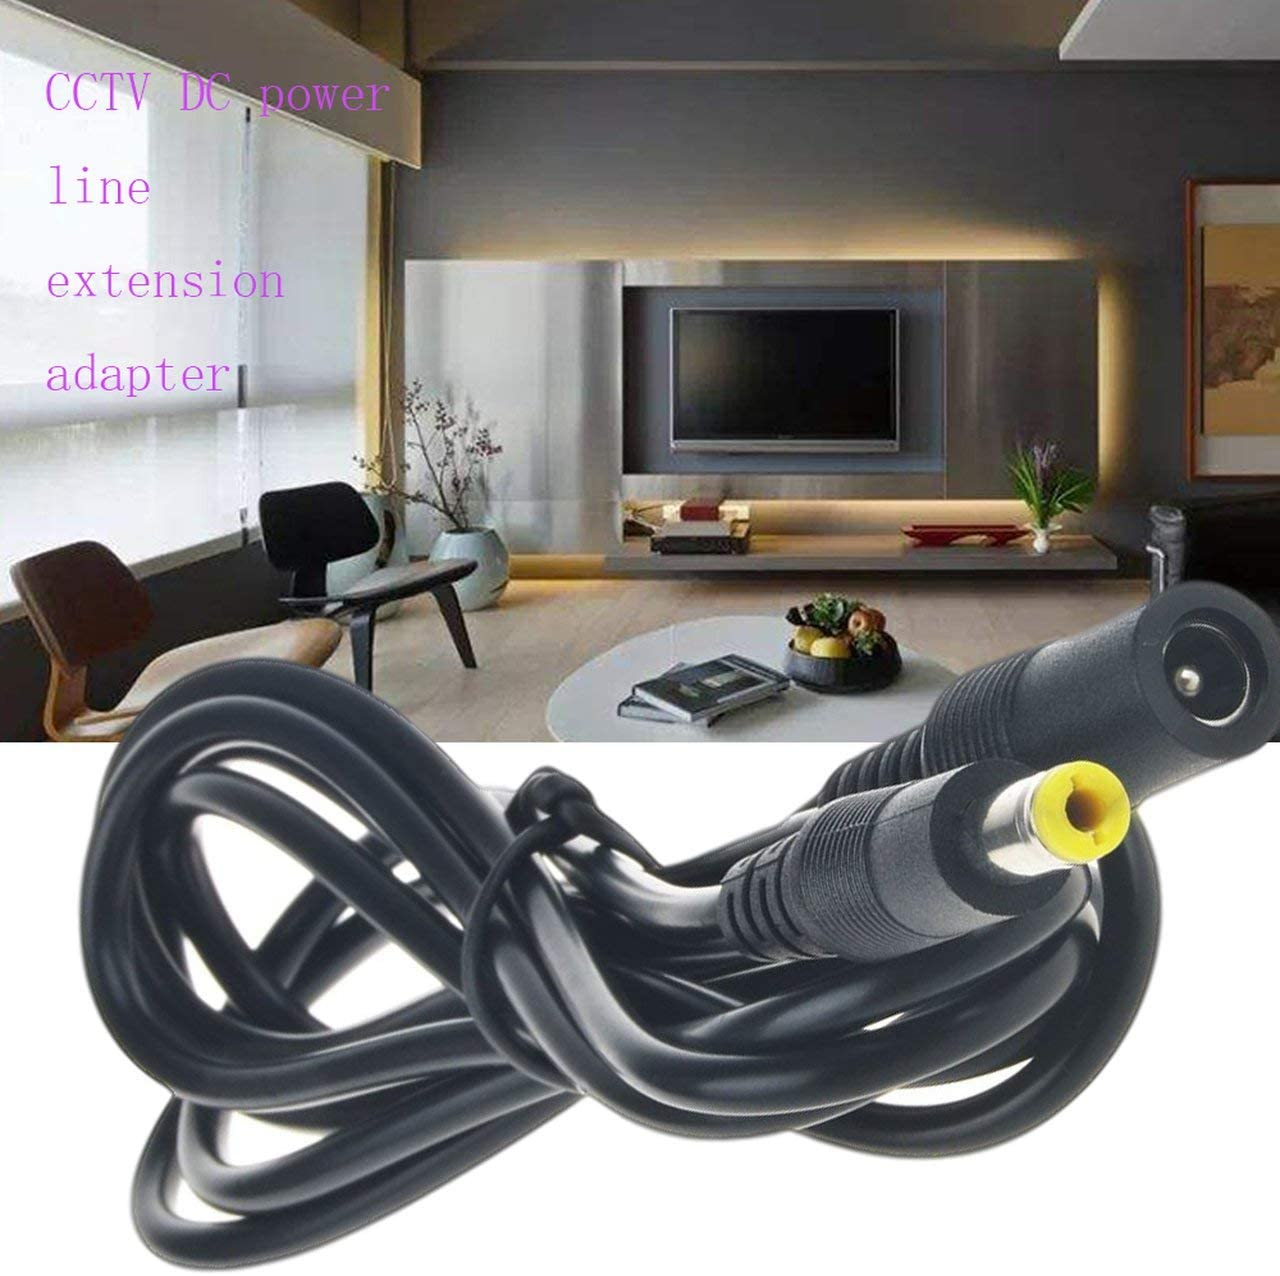 3m FRjasnyfall Noir 10ft 12v CCTV DC C/âble dalimentation Rallonge Adaptateur M/âle//Femelle 5.5mm x 2.1mm